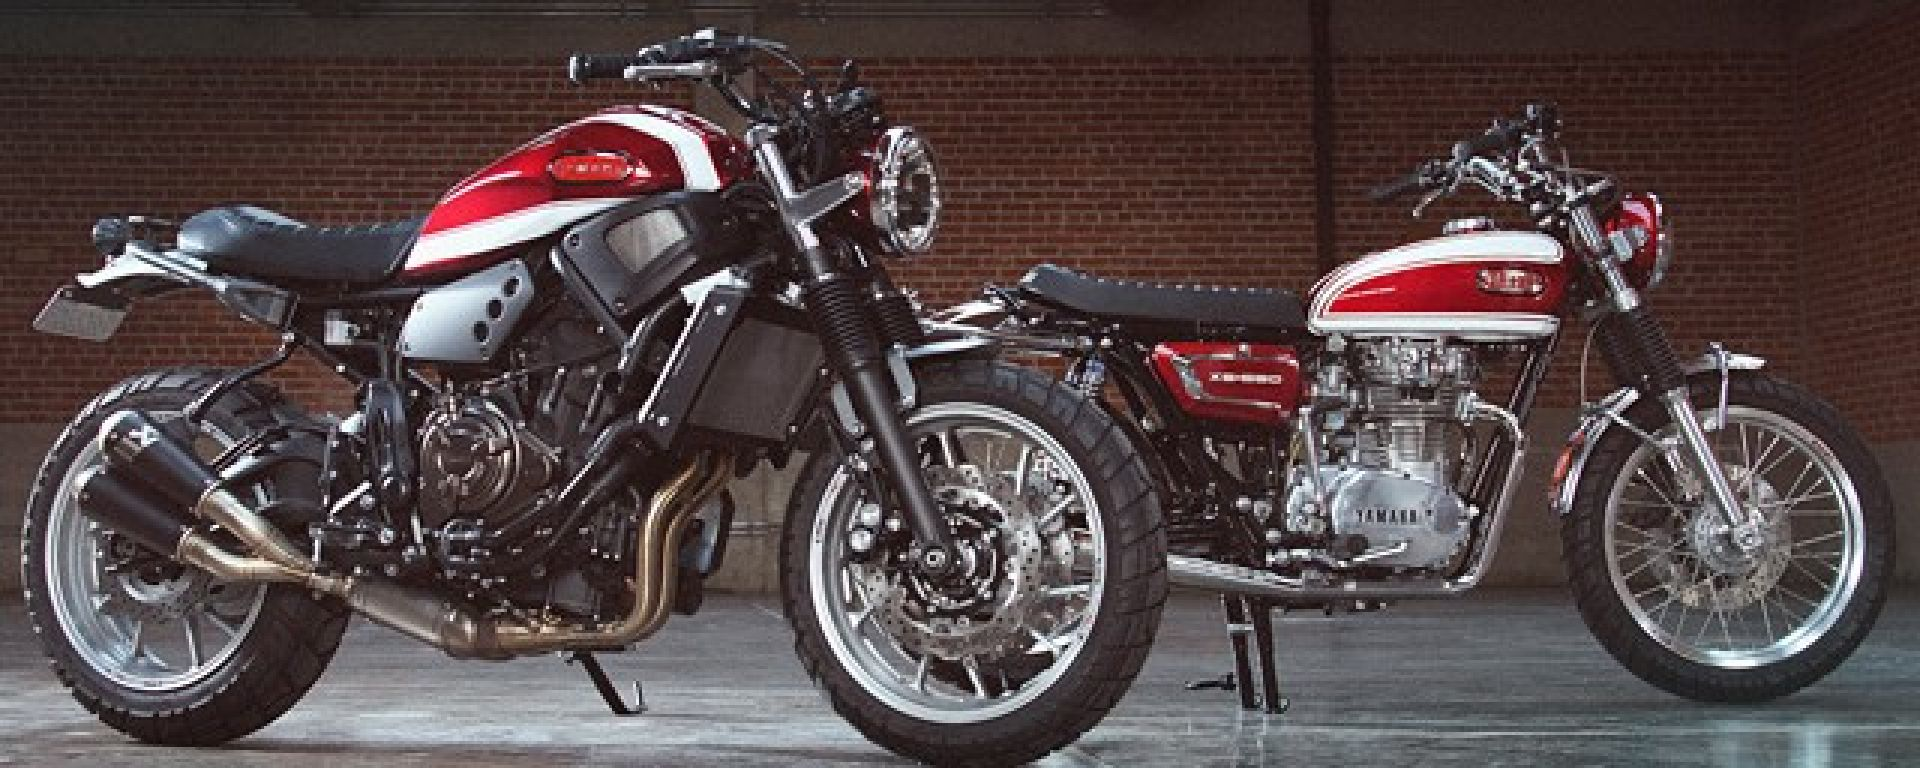 Yard Built Yamaha Fast father & Fast Son, c'è una certa somiglianza